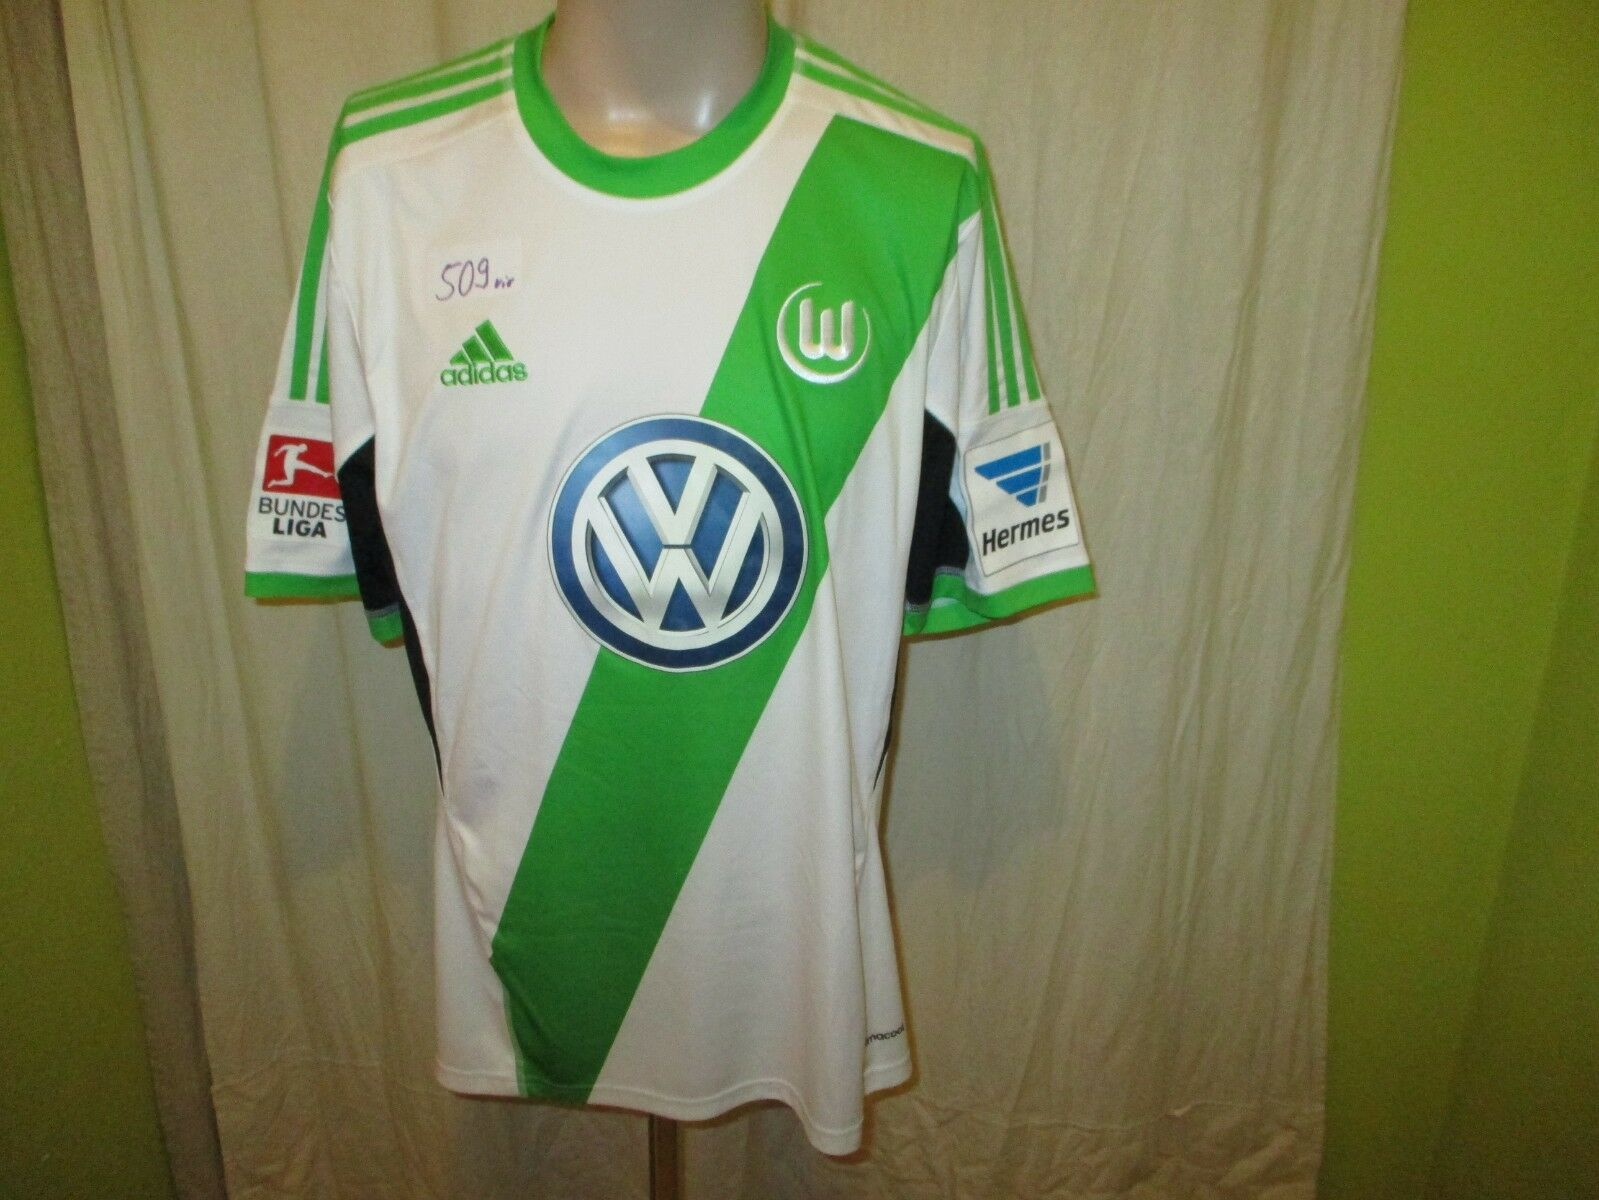 VfL Wolfsburg Original Original Original Adidas Heim Trikot 2013 14  VW  + Nr.31 Knoche Gr.L Neu 1218ea